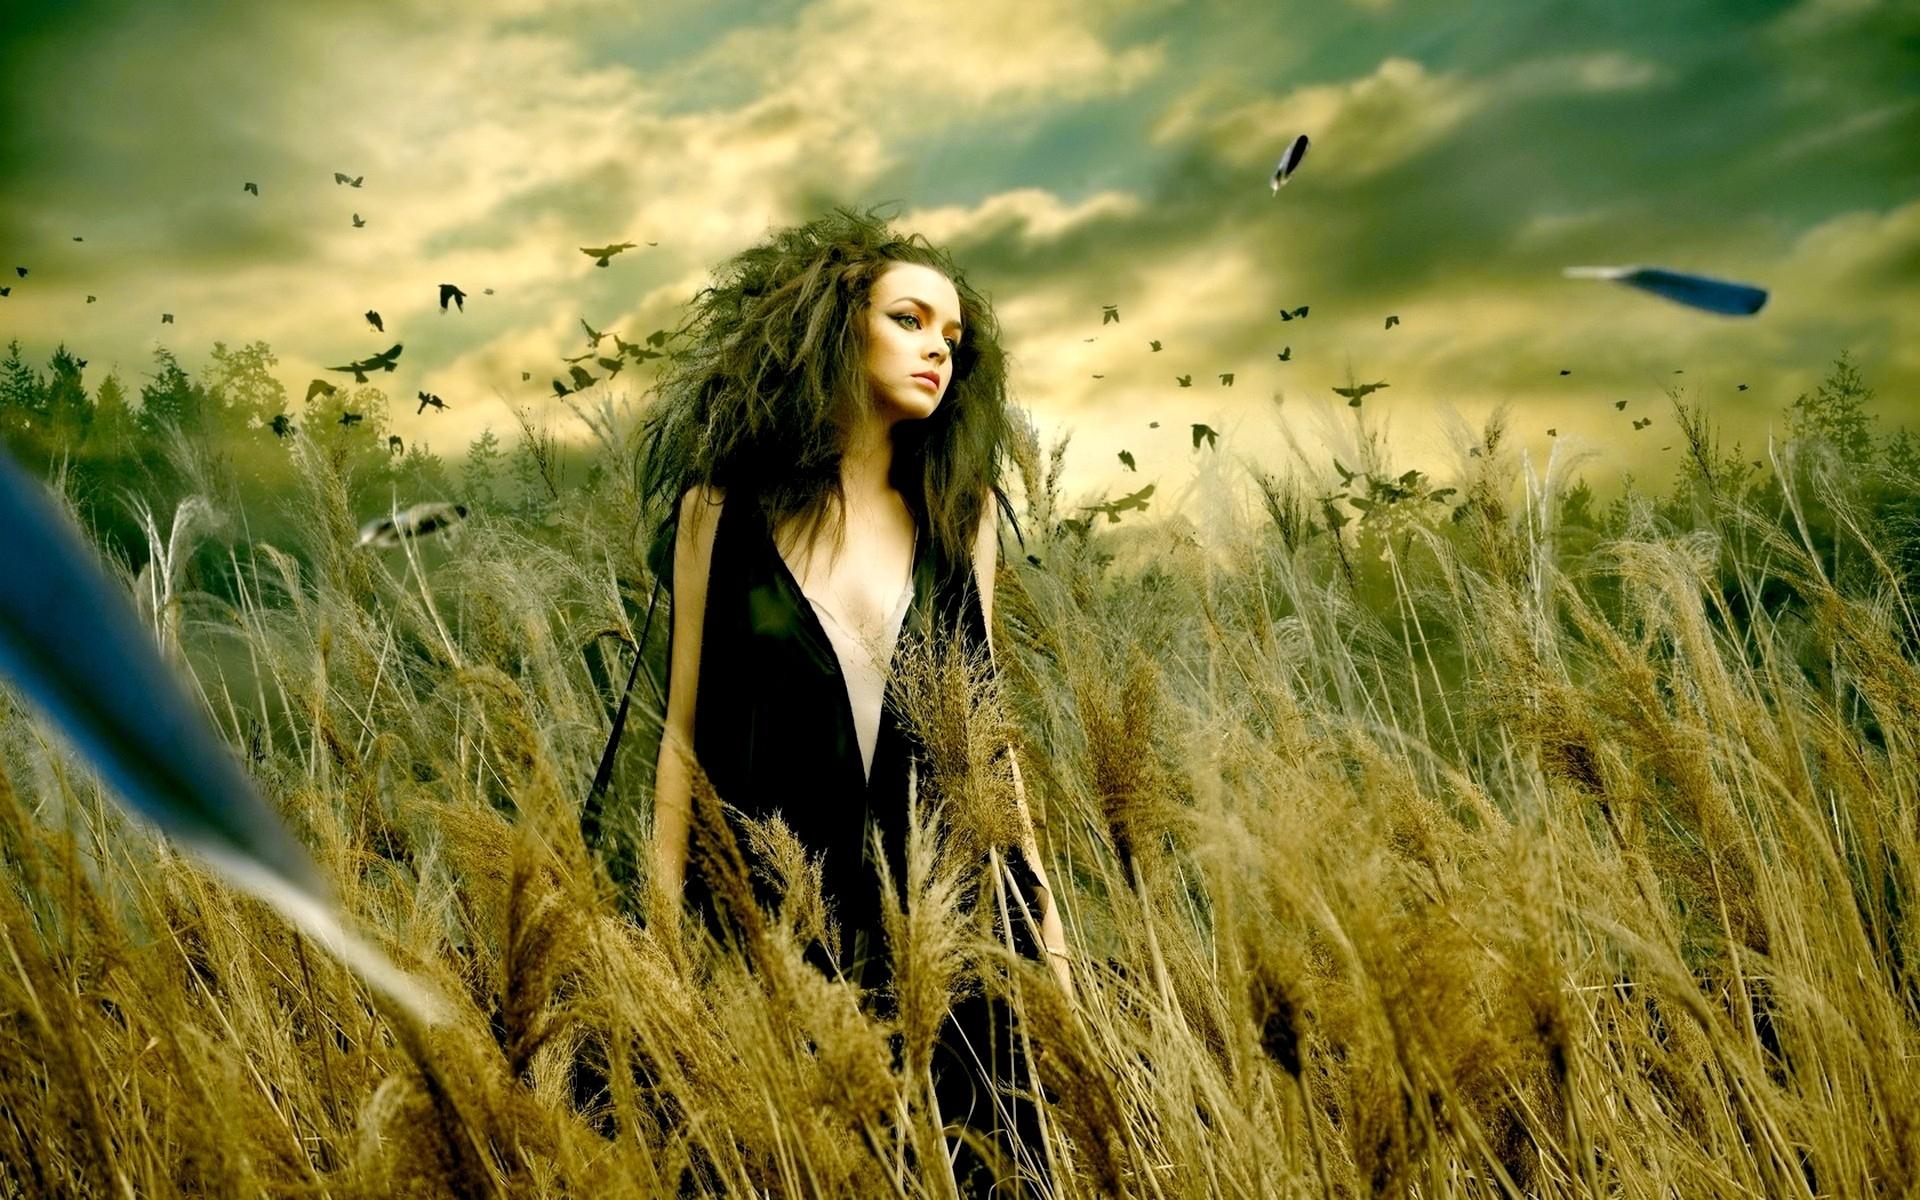 manipulation cg digital art landscapes nature feathers